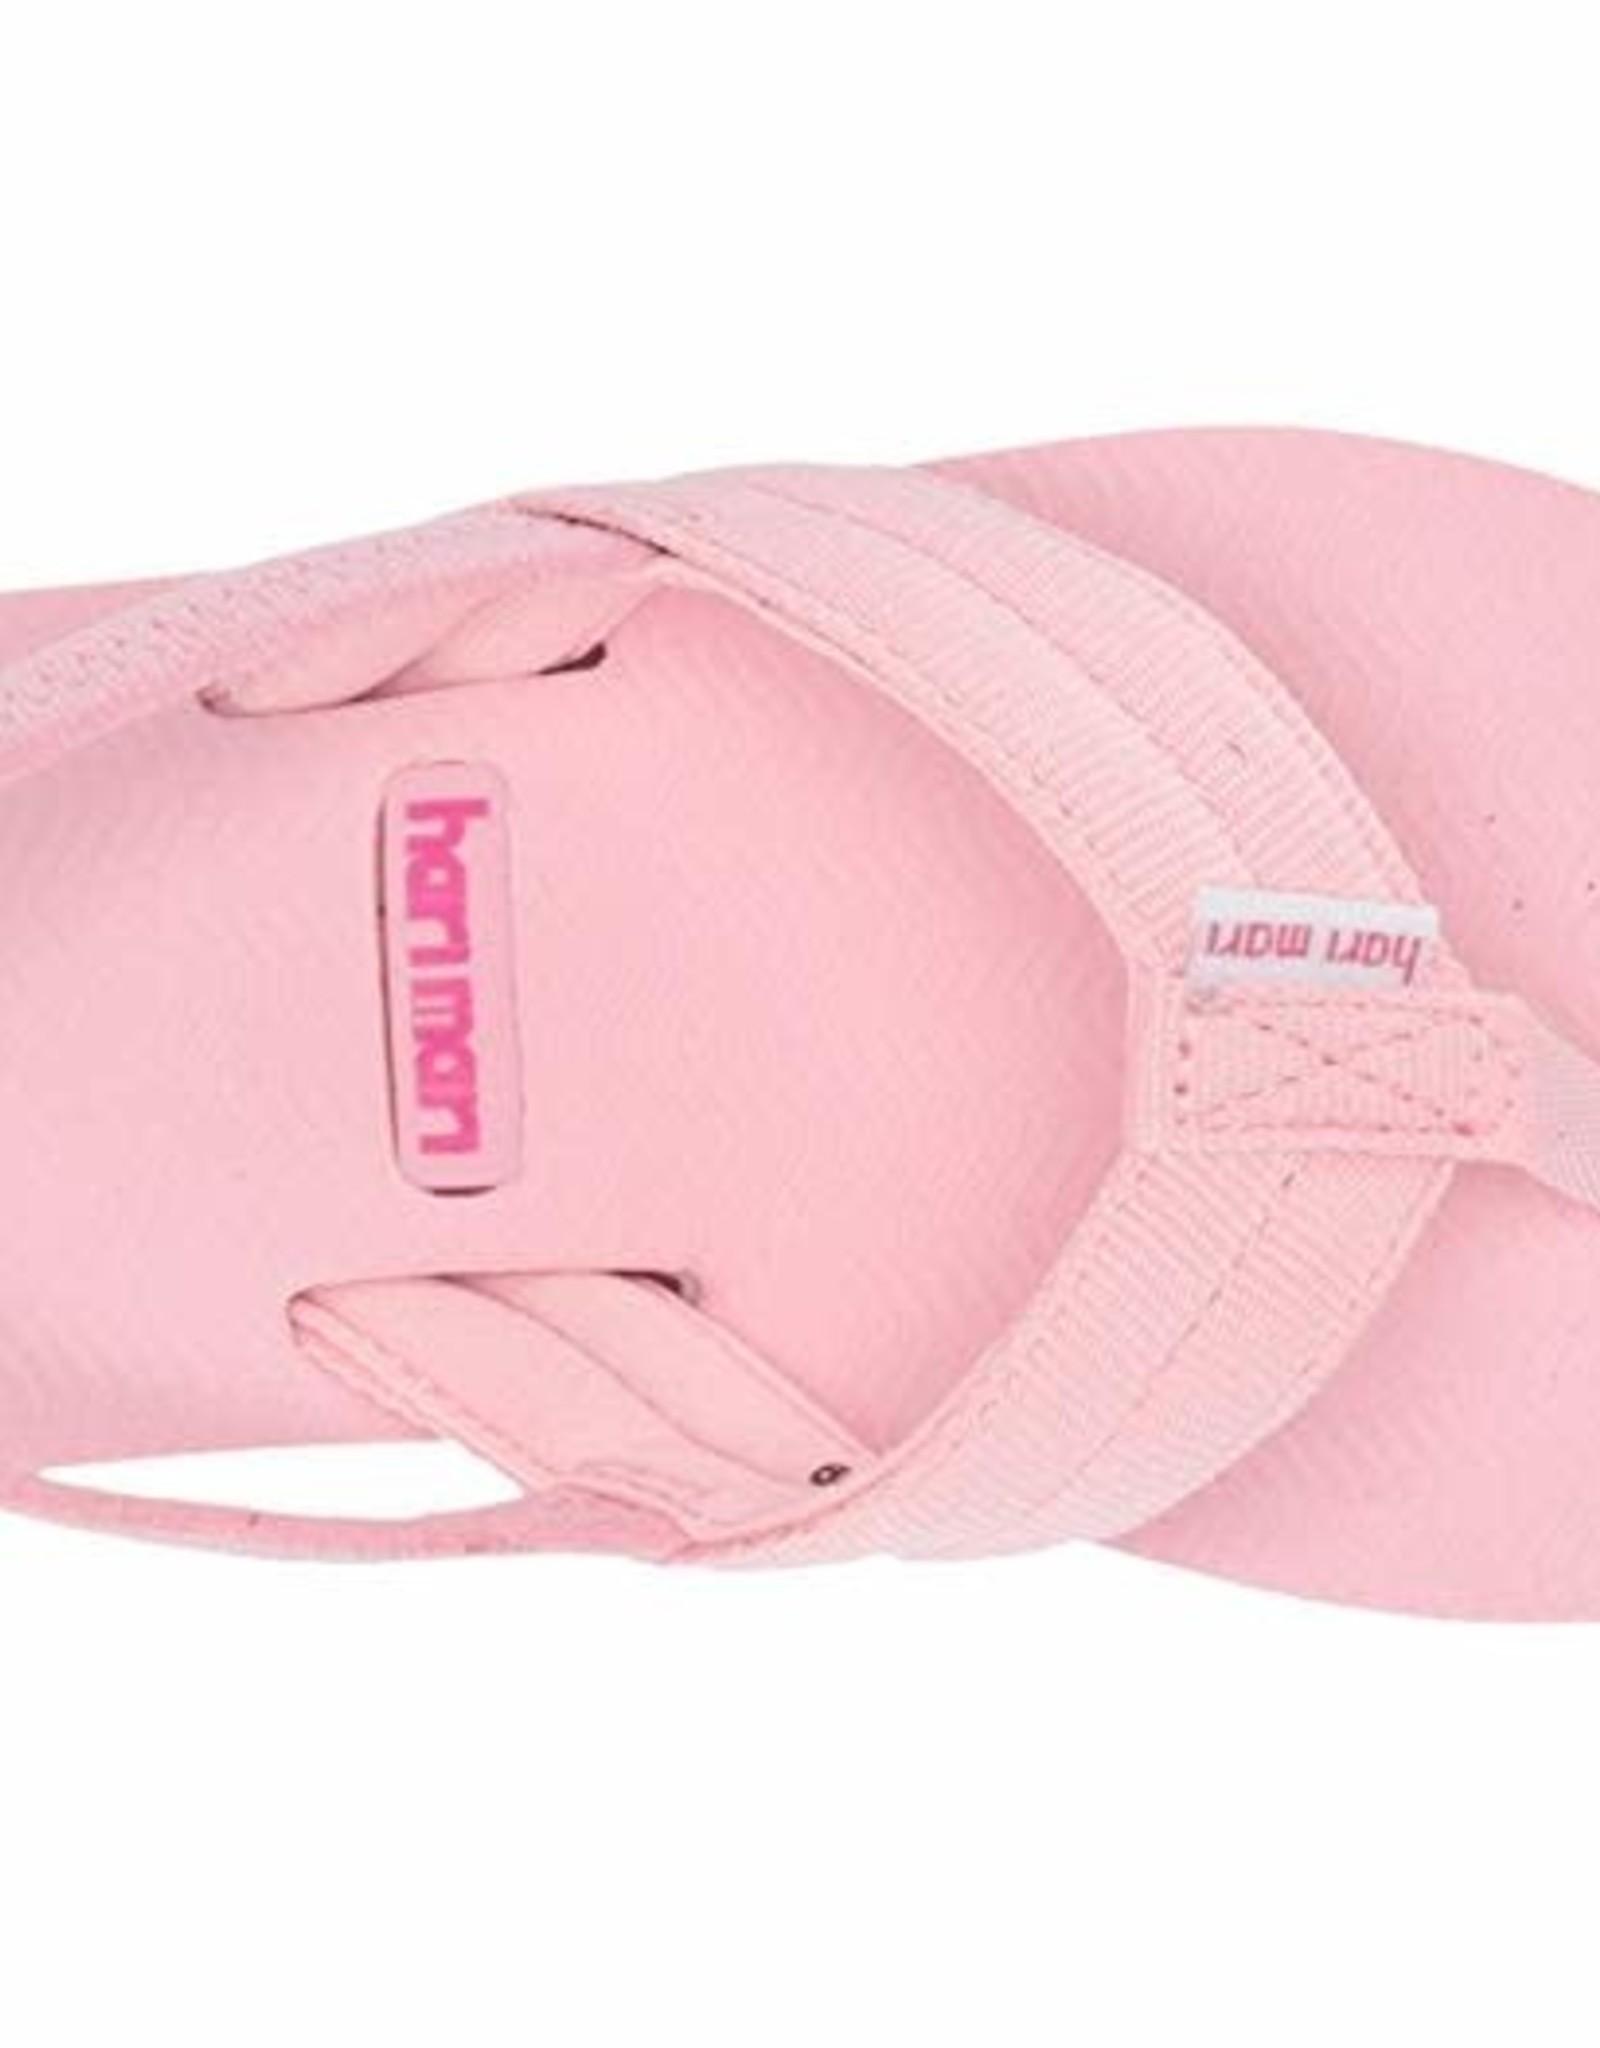 Hari Mari dunes- light pink